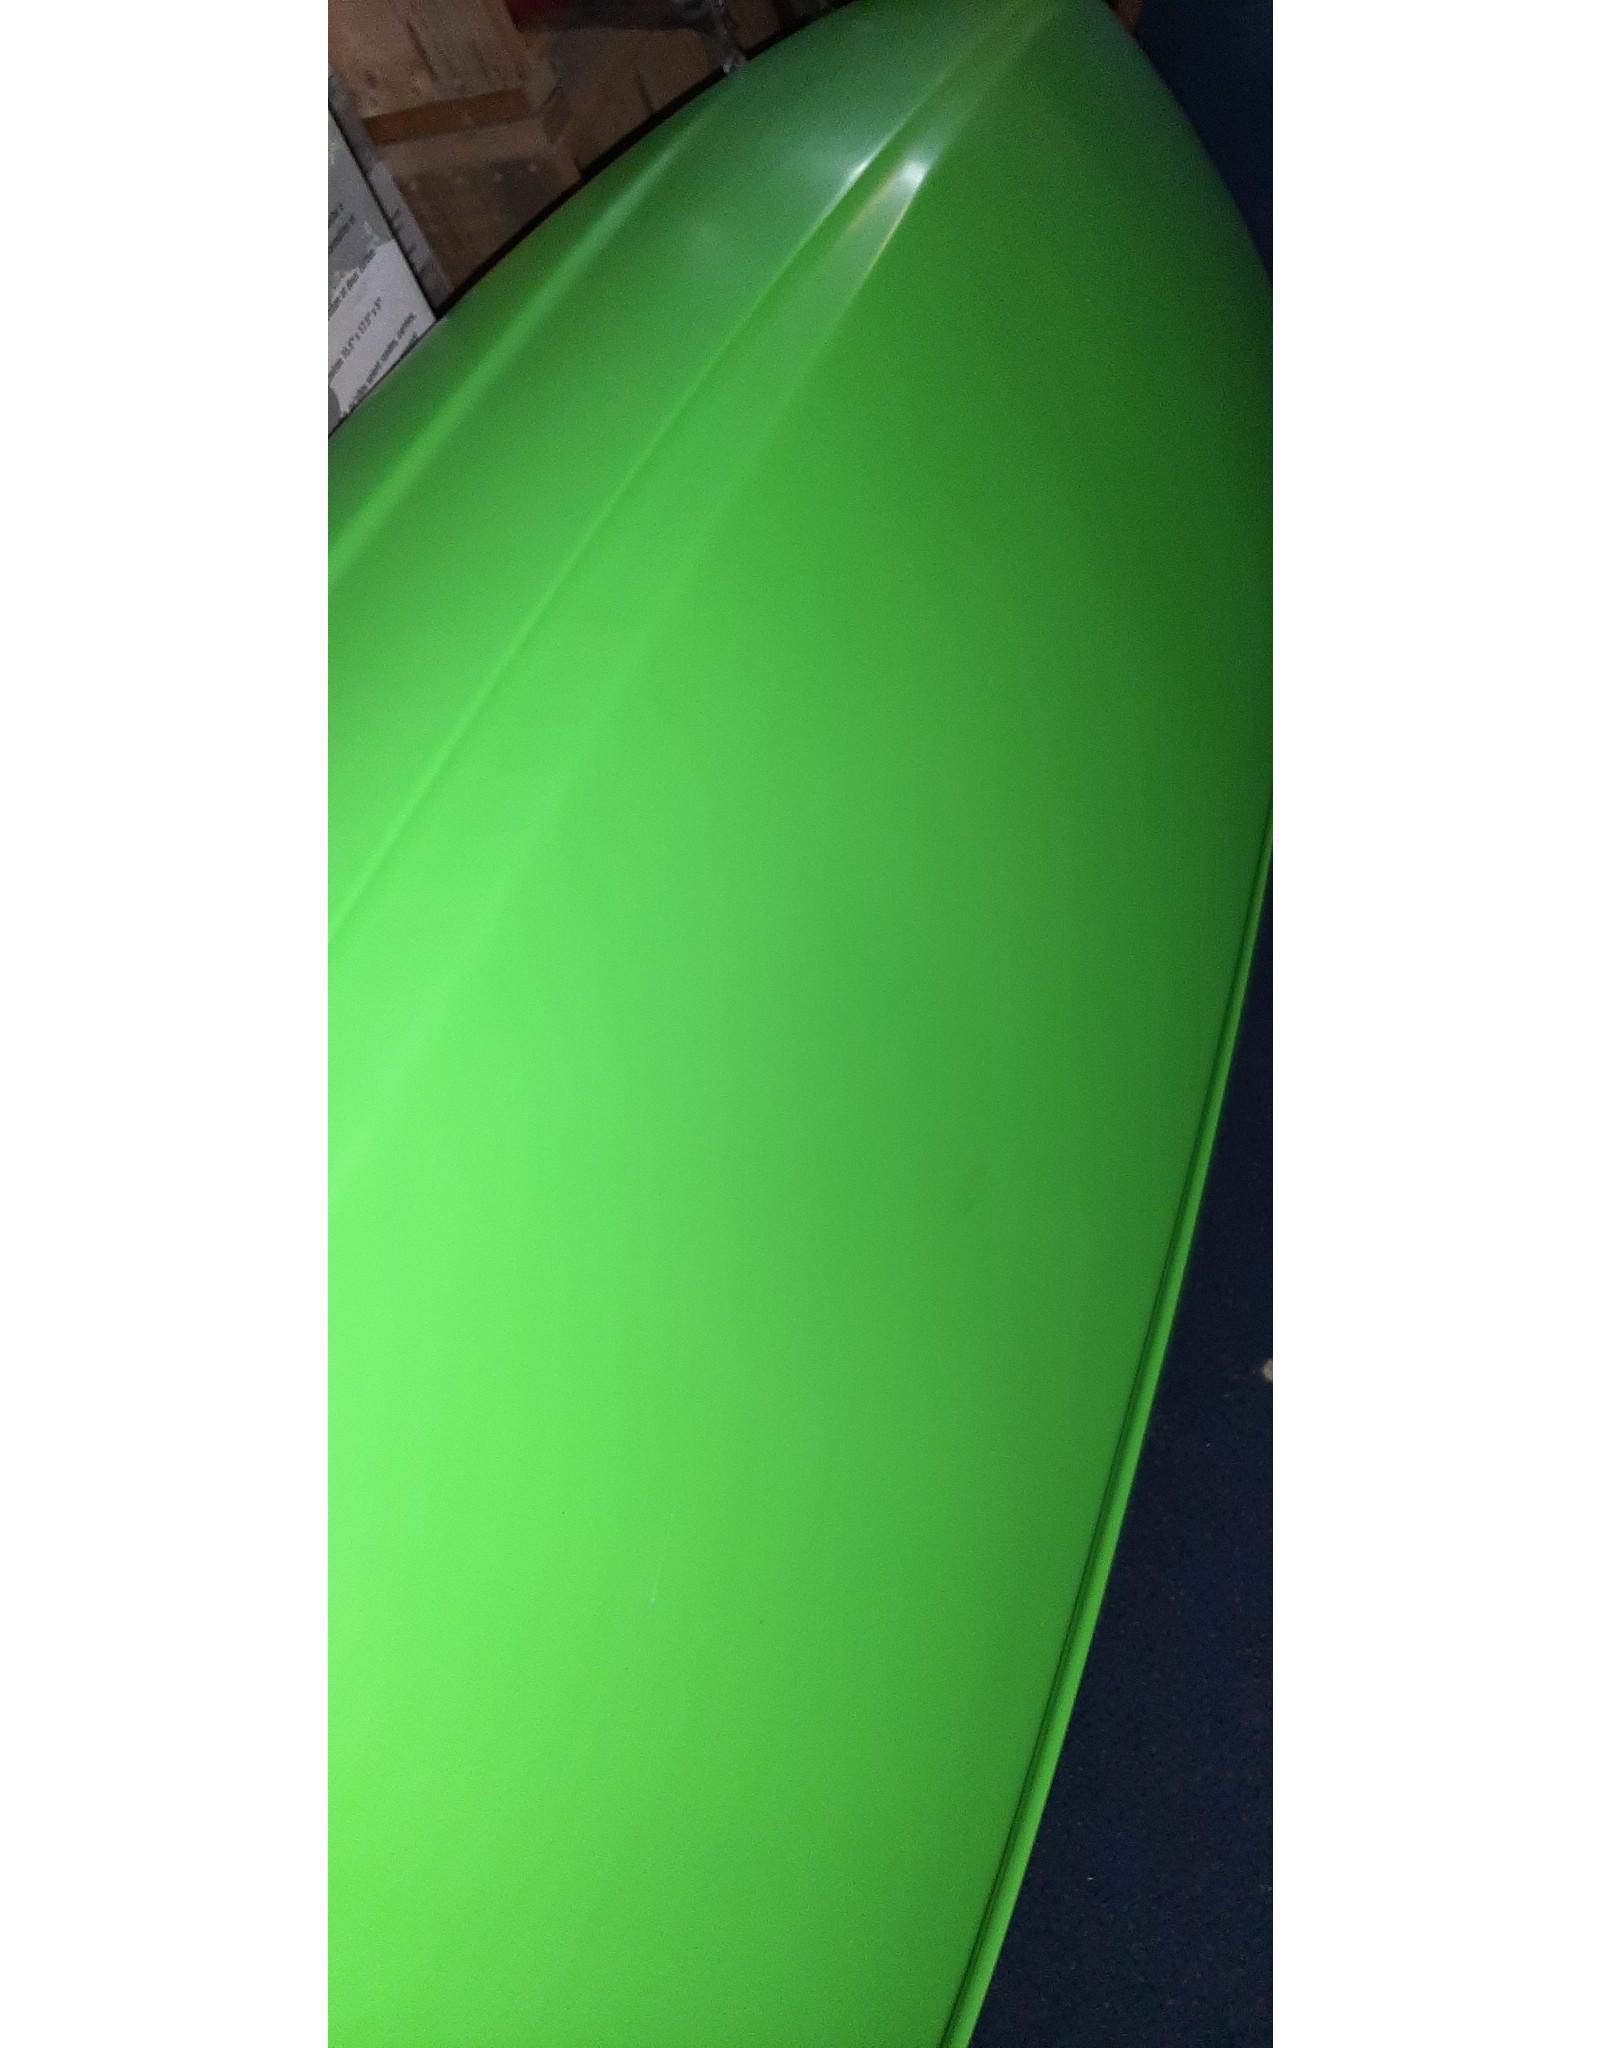 Jackson Kayaks Jackson kayak Antix Lime Small (LIQUIDATION)